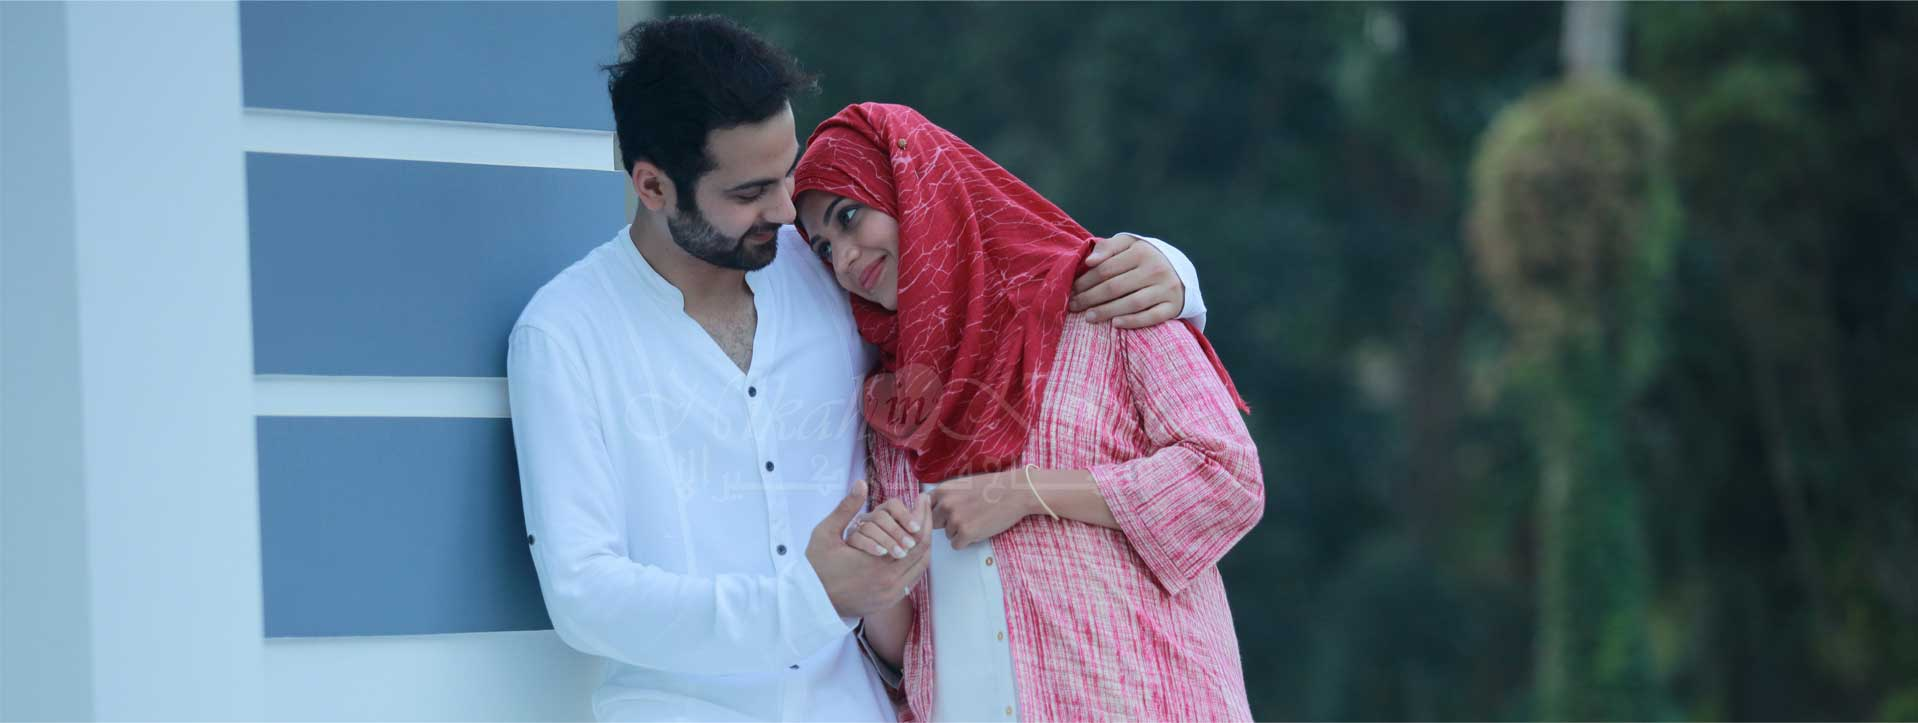 Divorced matrimonial muslim widow Muslim Widow